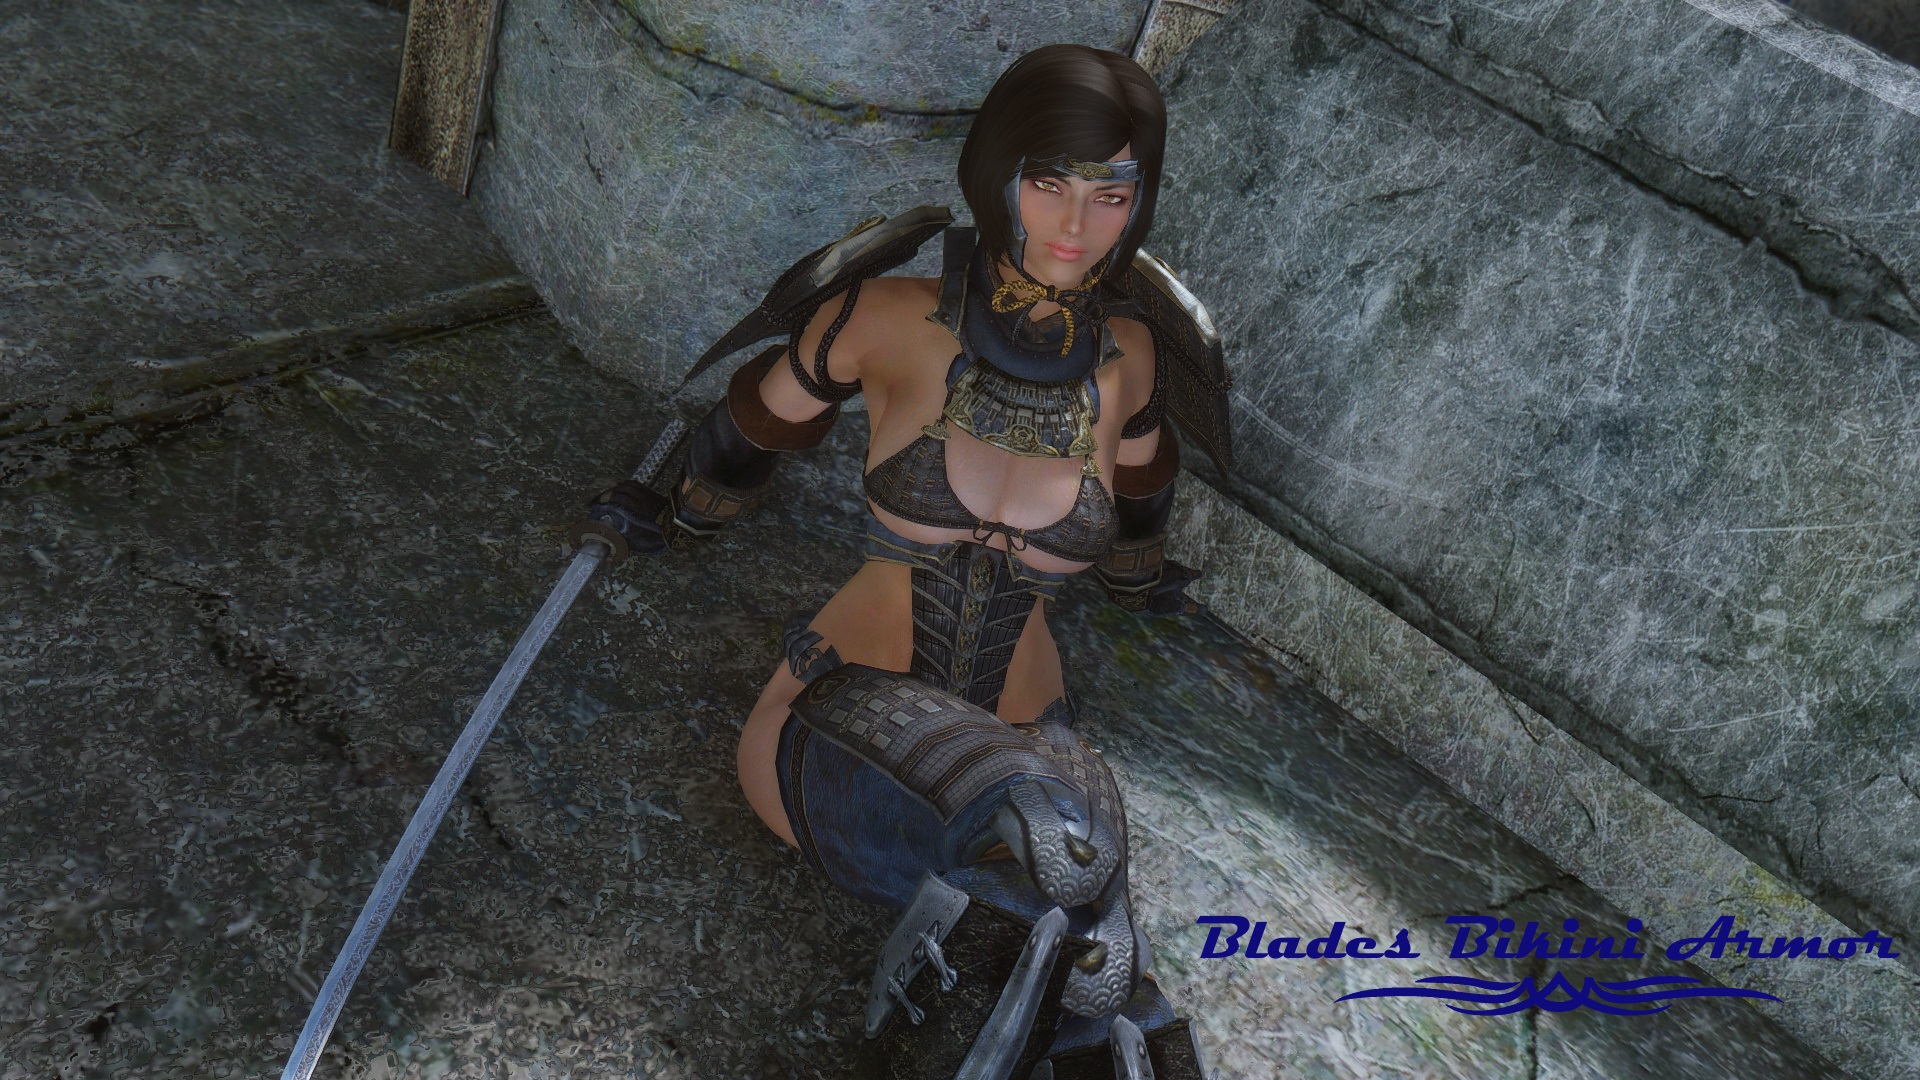 Blades_Bikini_Armor.jpg